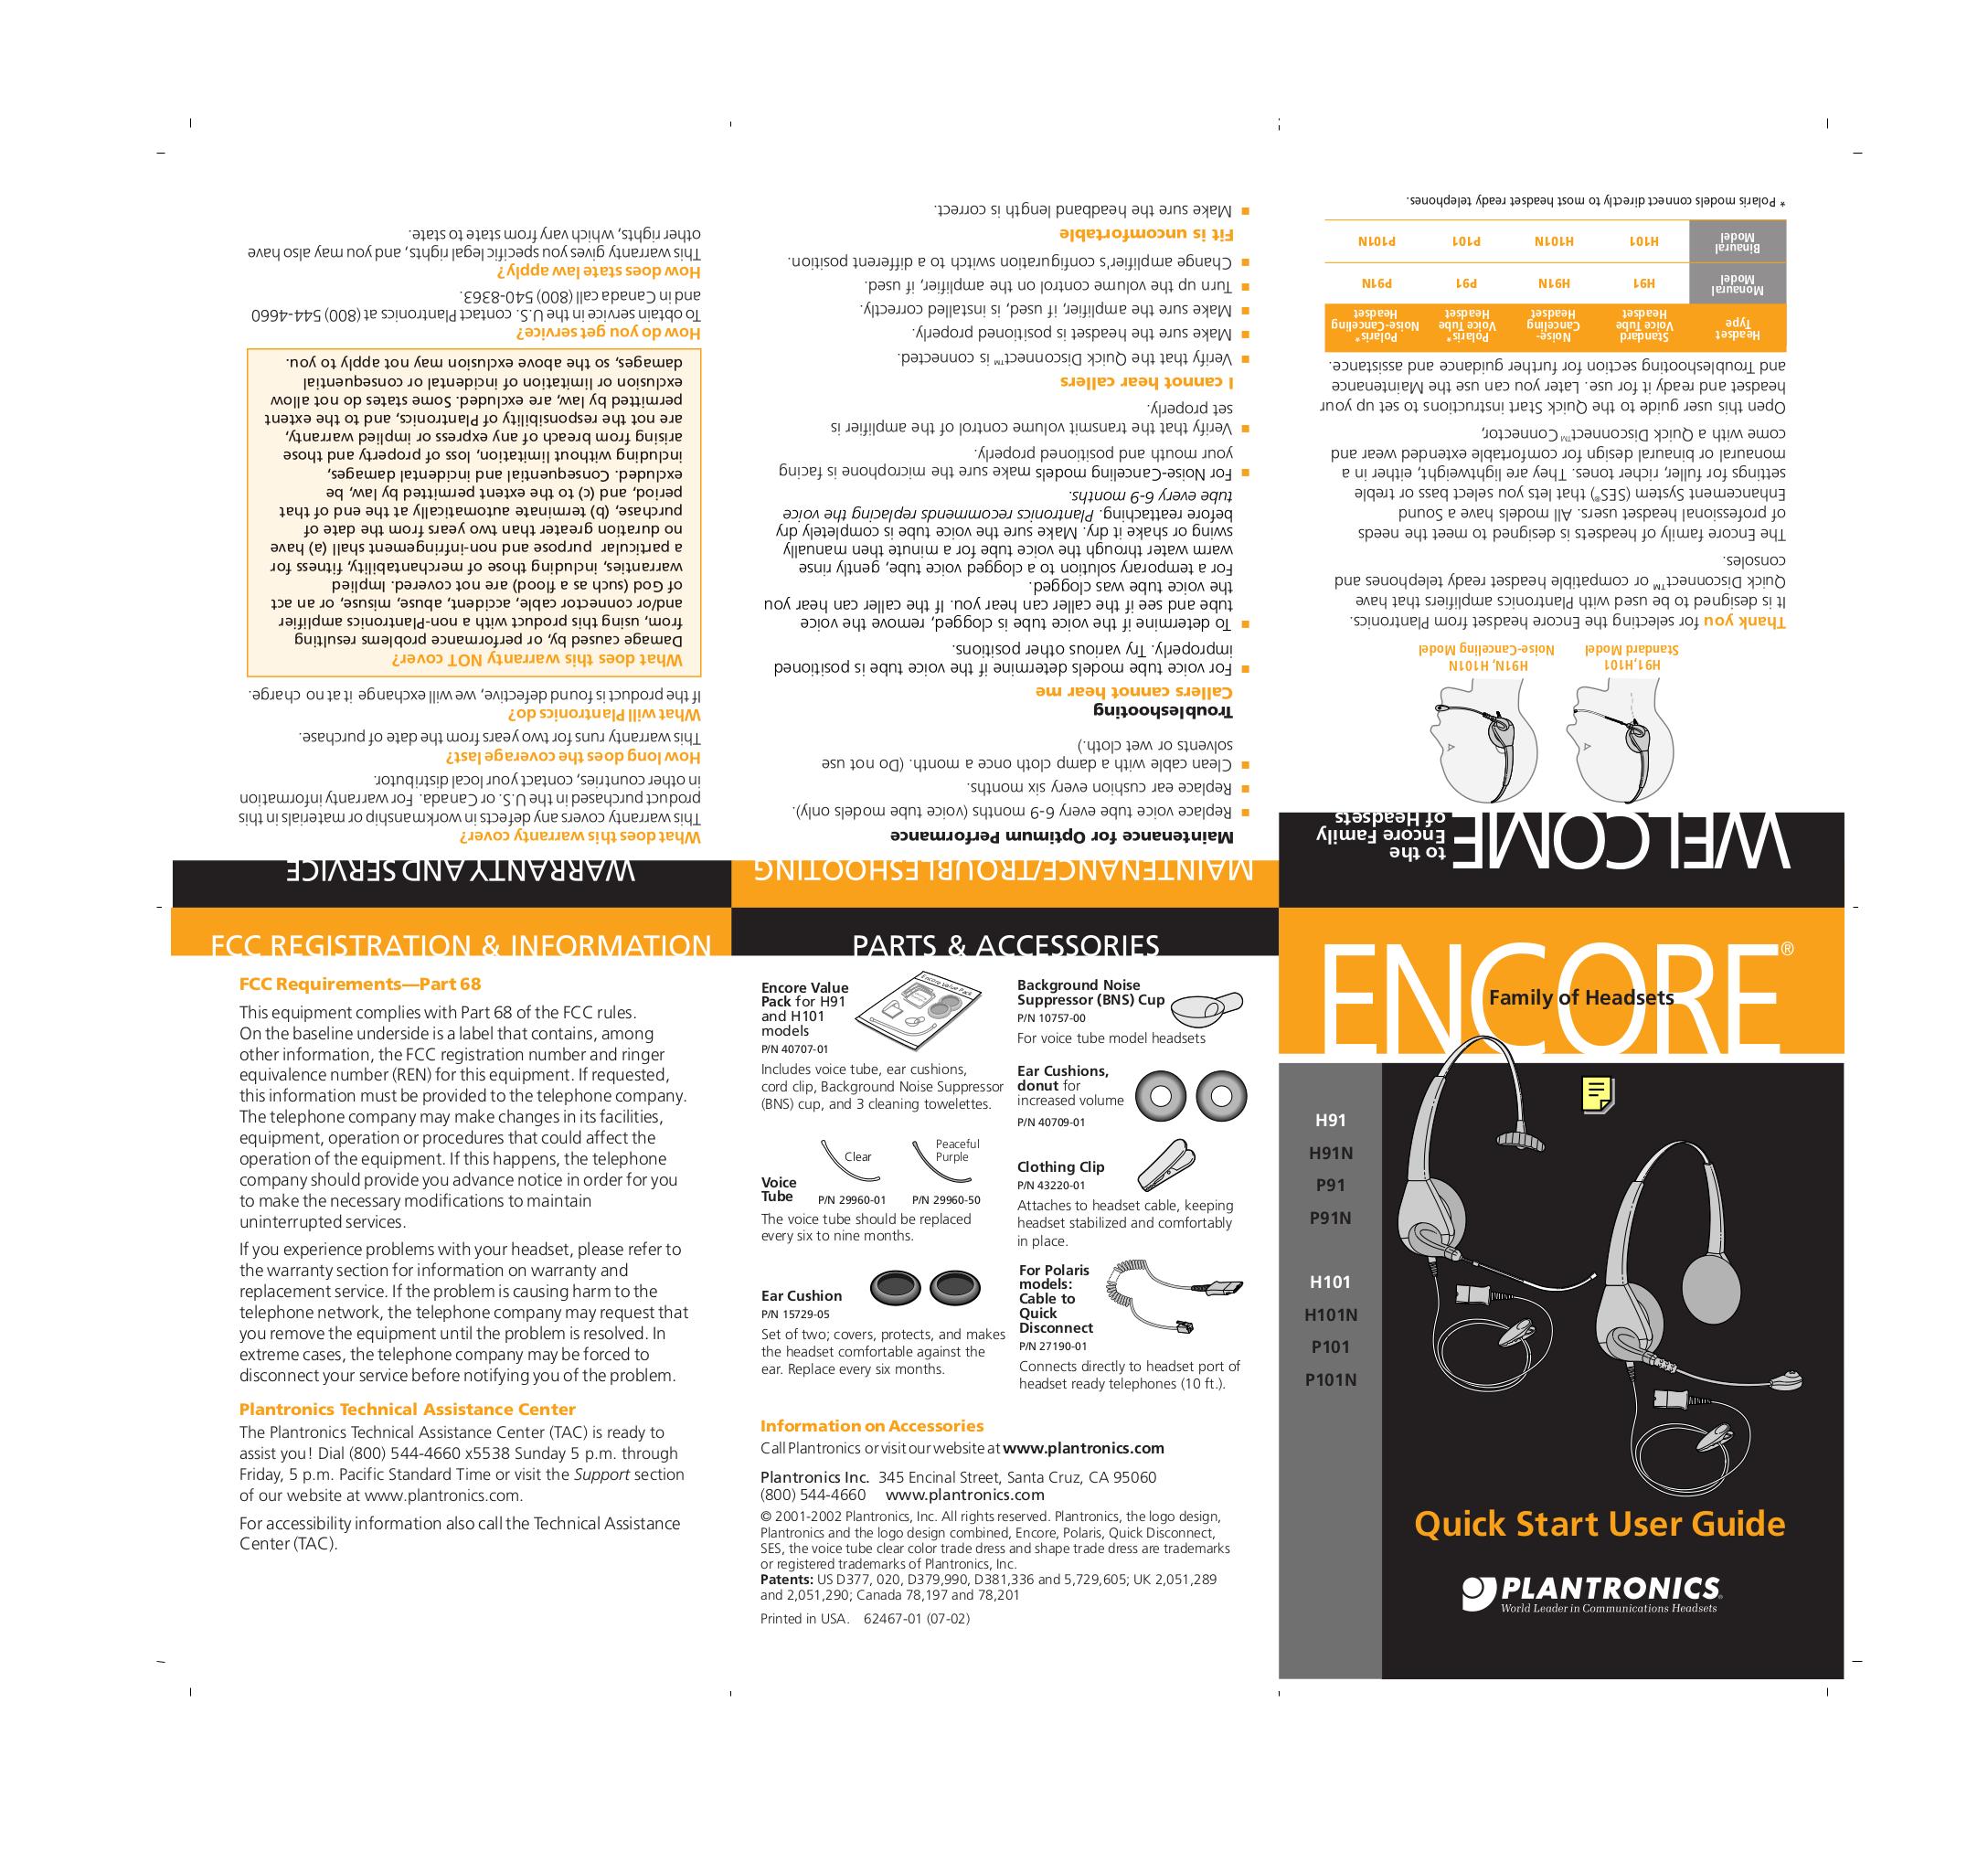 Download free pdf for Plantronics Encore H101 Headset manual